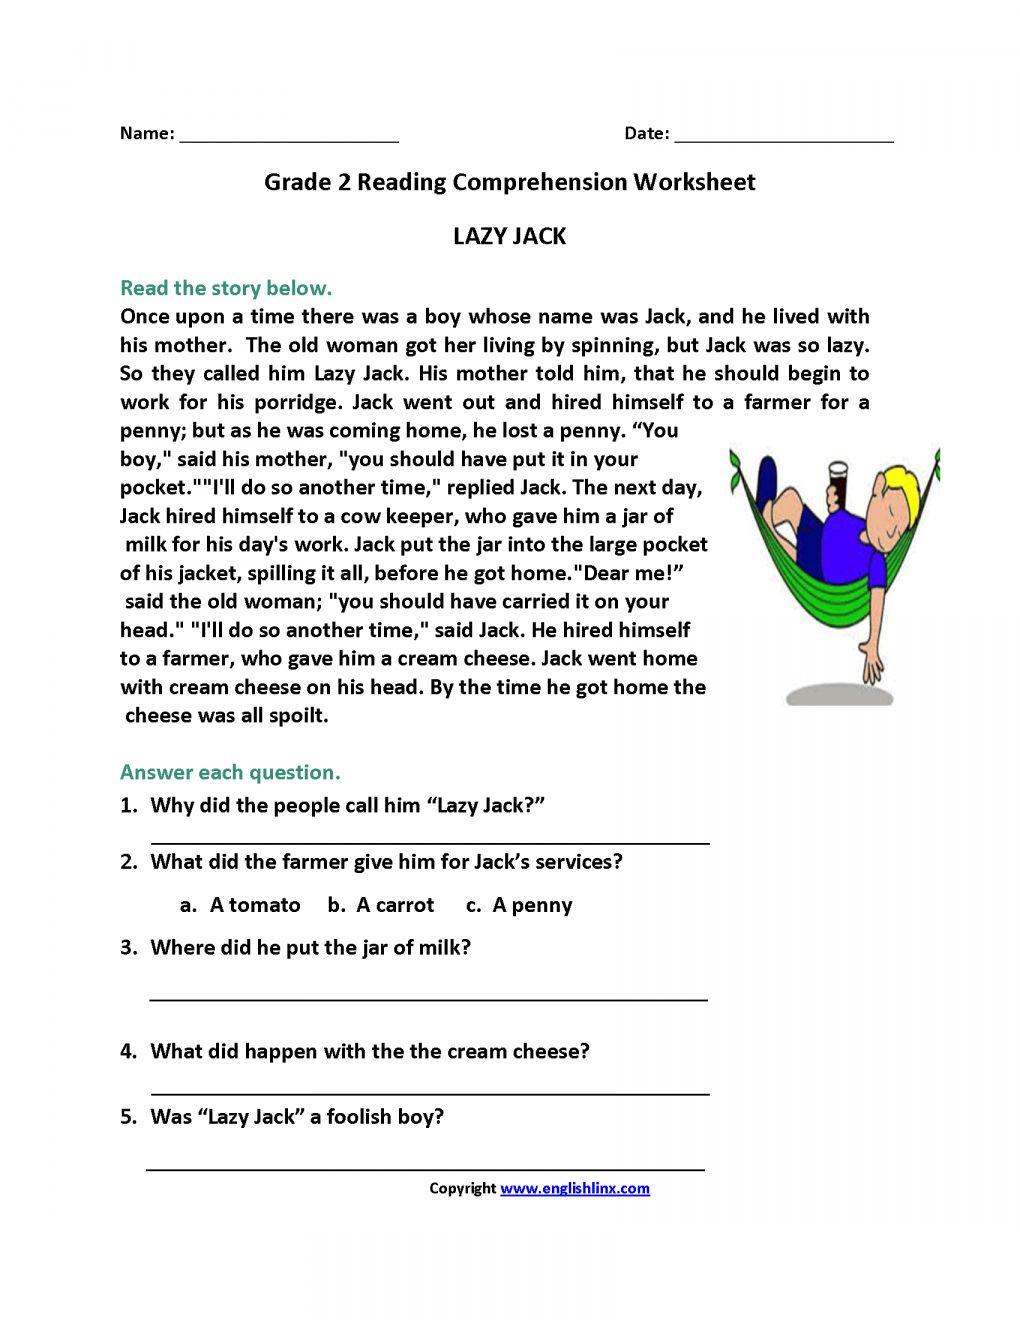 12 2nd Grade Reading Worksheet Packets Reading Chartsheet Net In 2020 Reading Comprehension Worksheets 2nd Grade Reading Worksheets Reading Comprehension